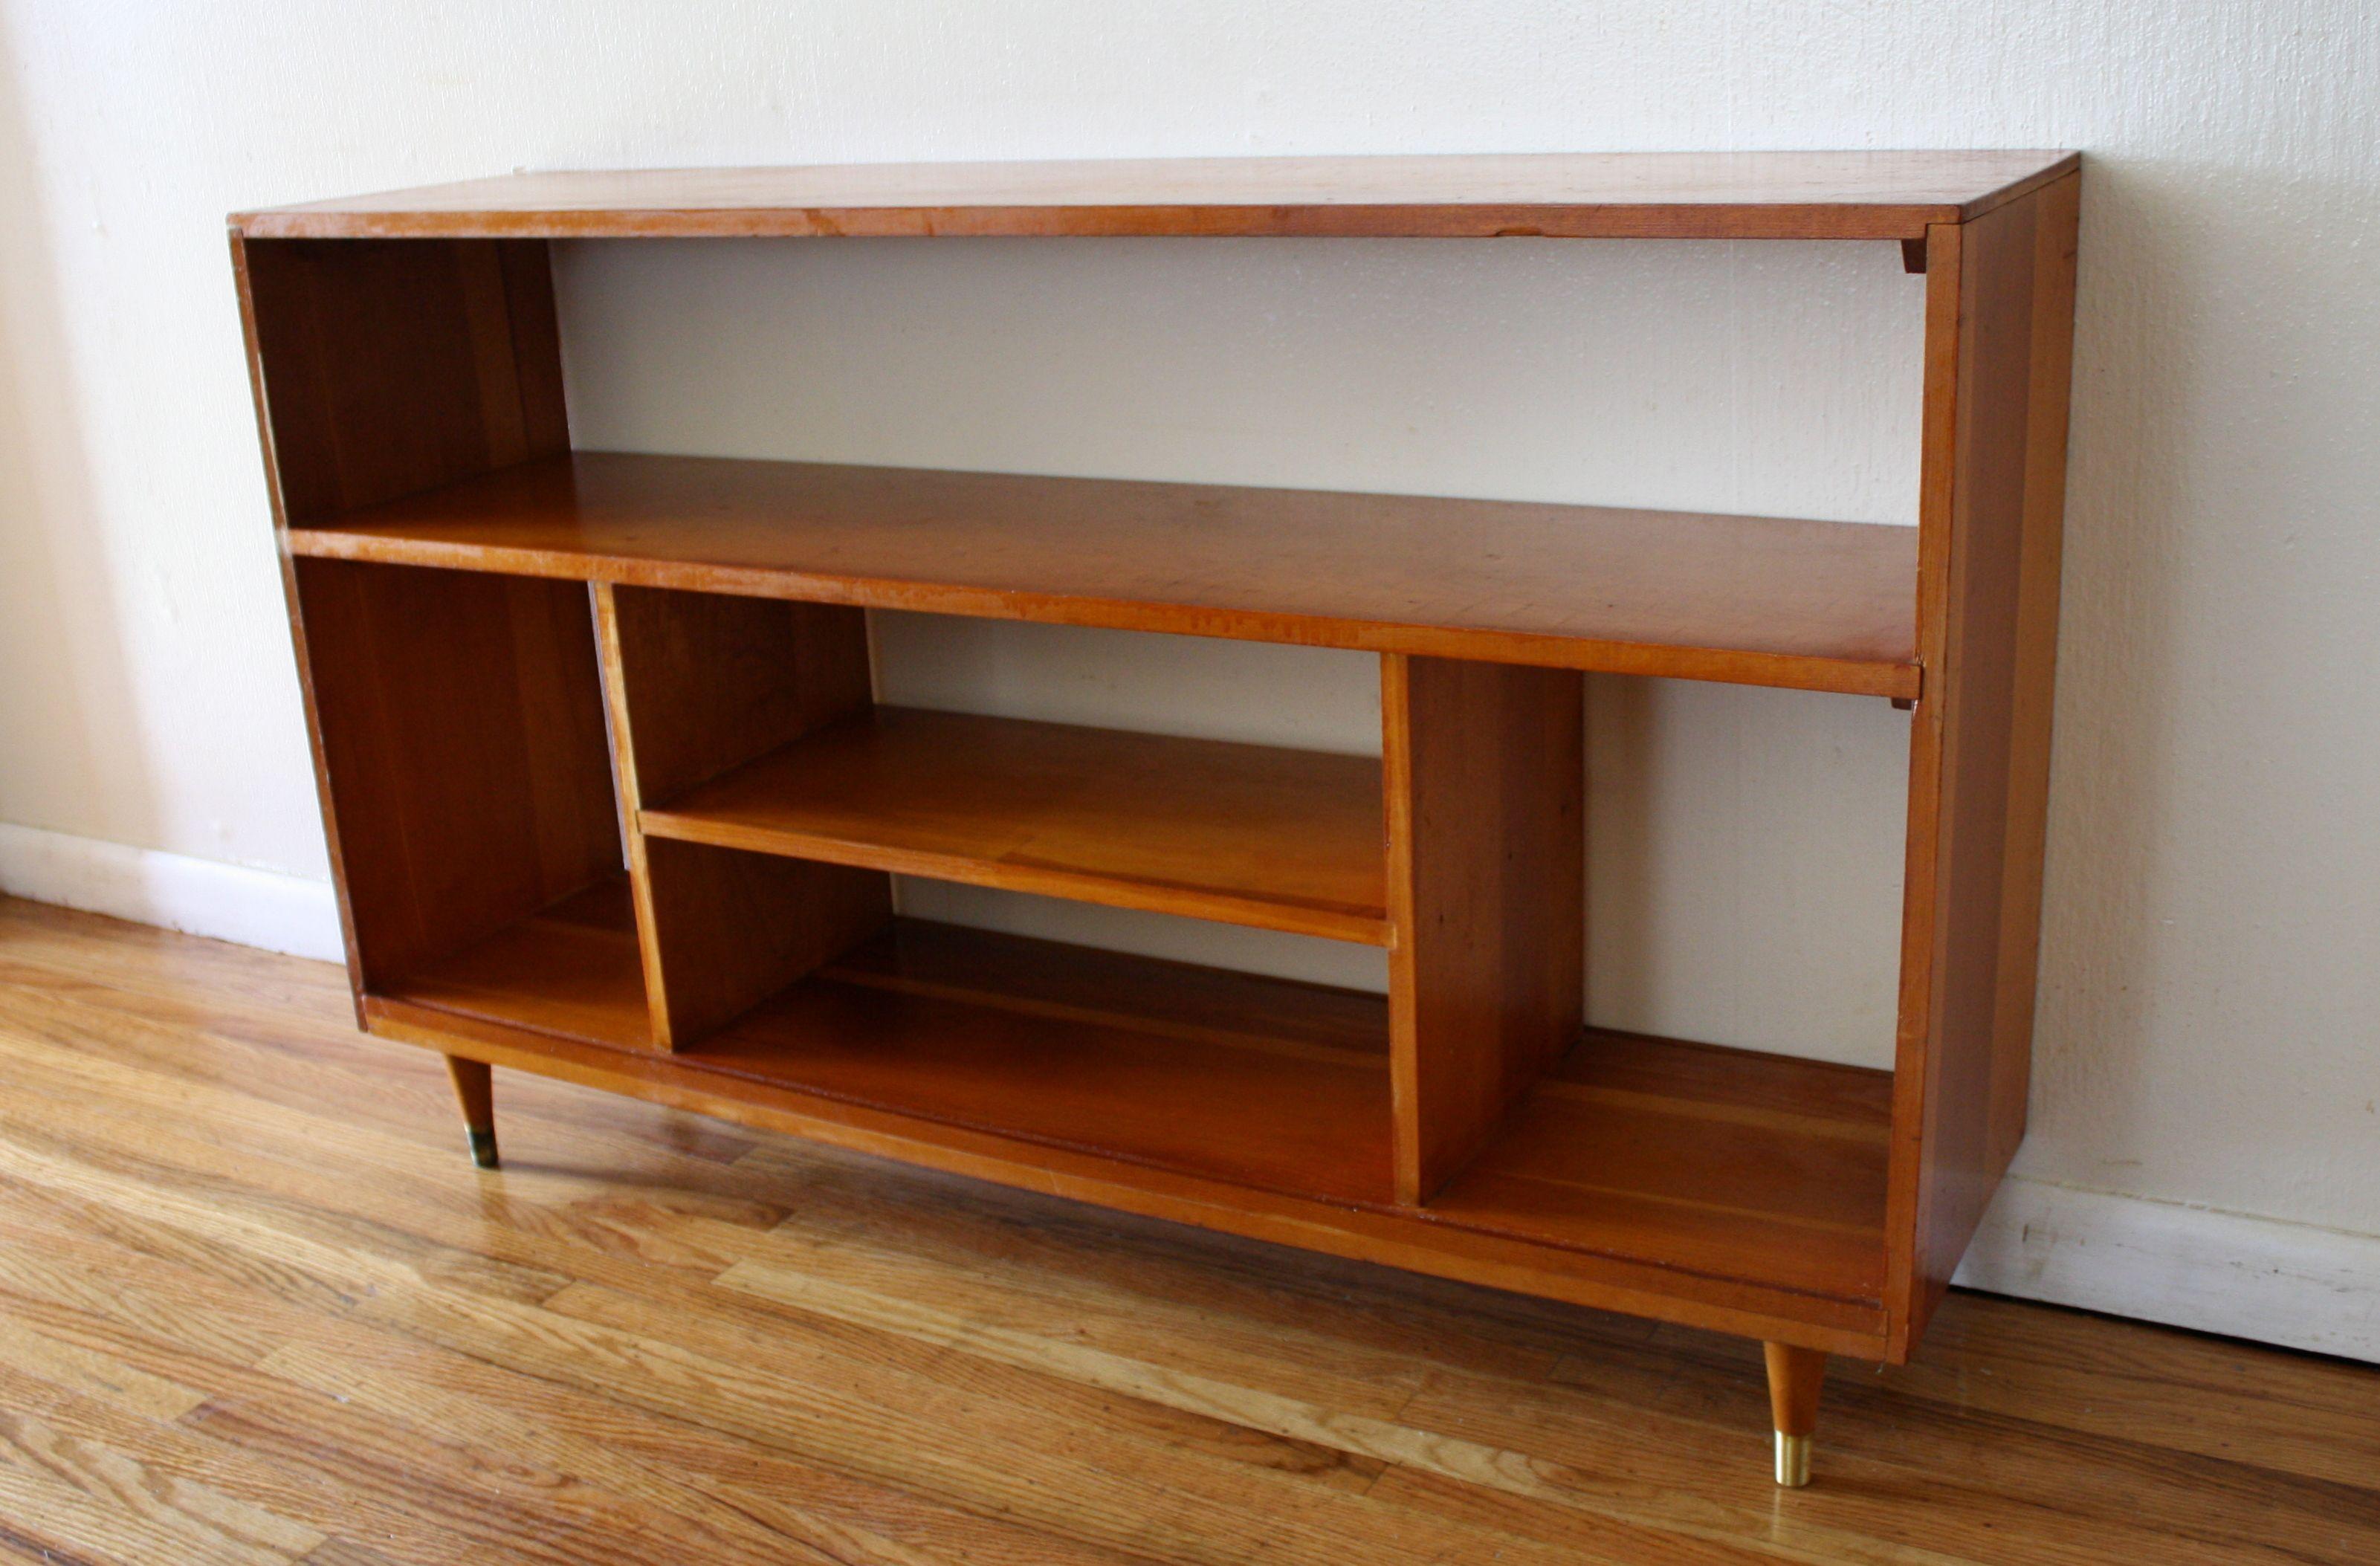 Humby Decoration Mid Century Modern Bookshelf Storage Style